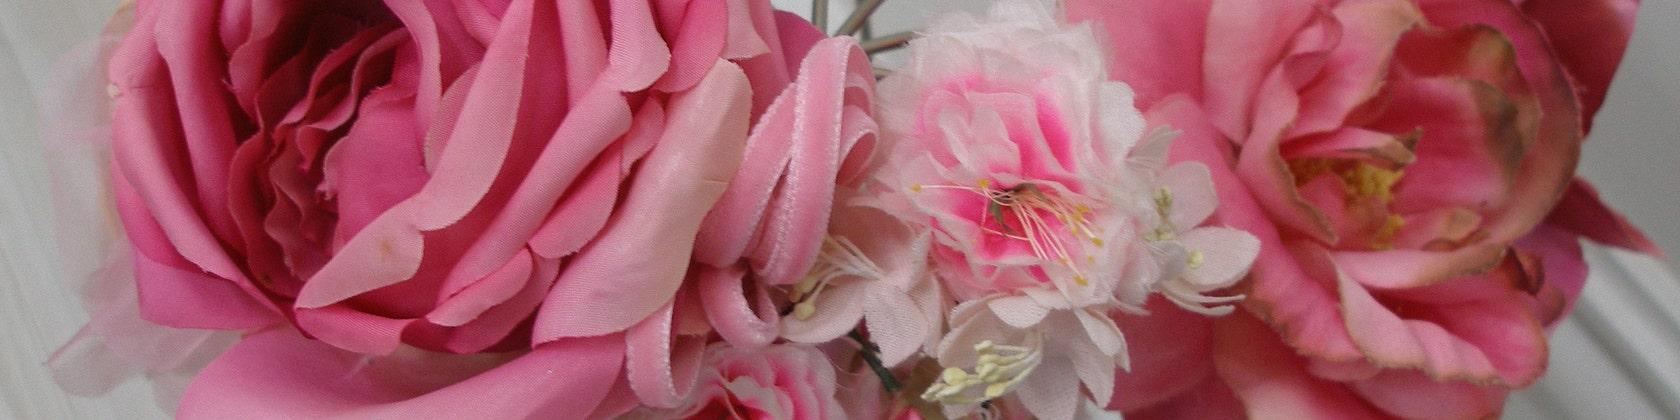 "Adel Bleistift /""Flowers/"" 4 Stück verschiedene Designs"